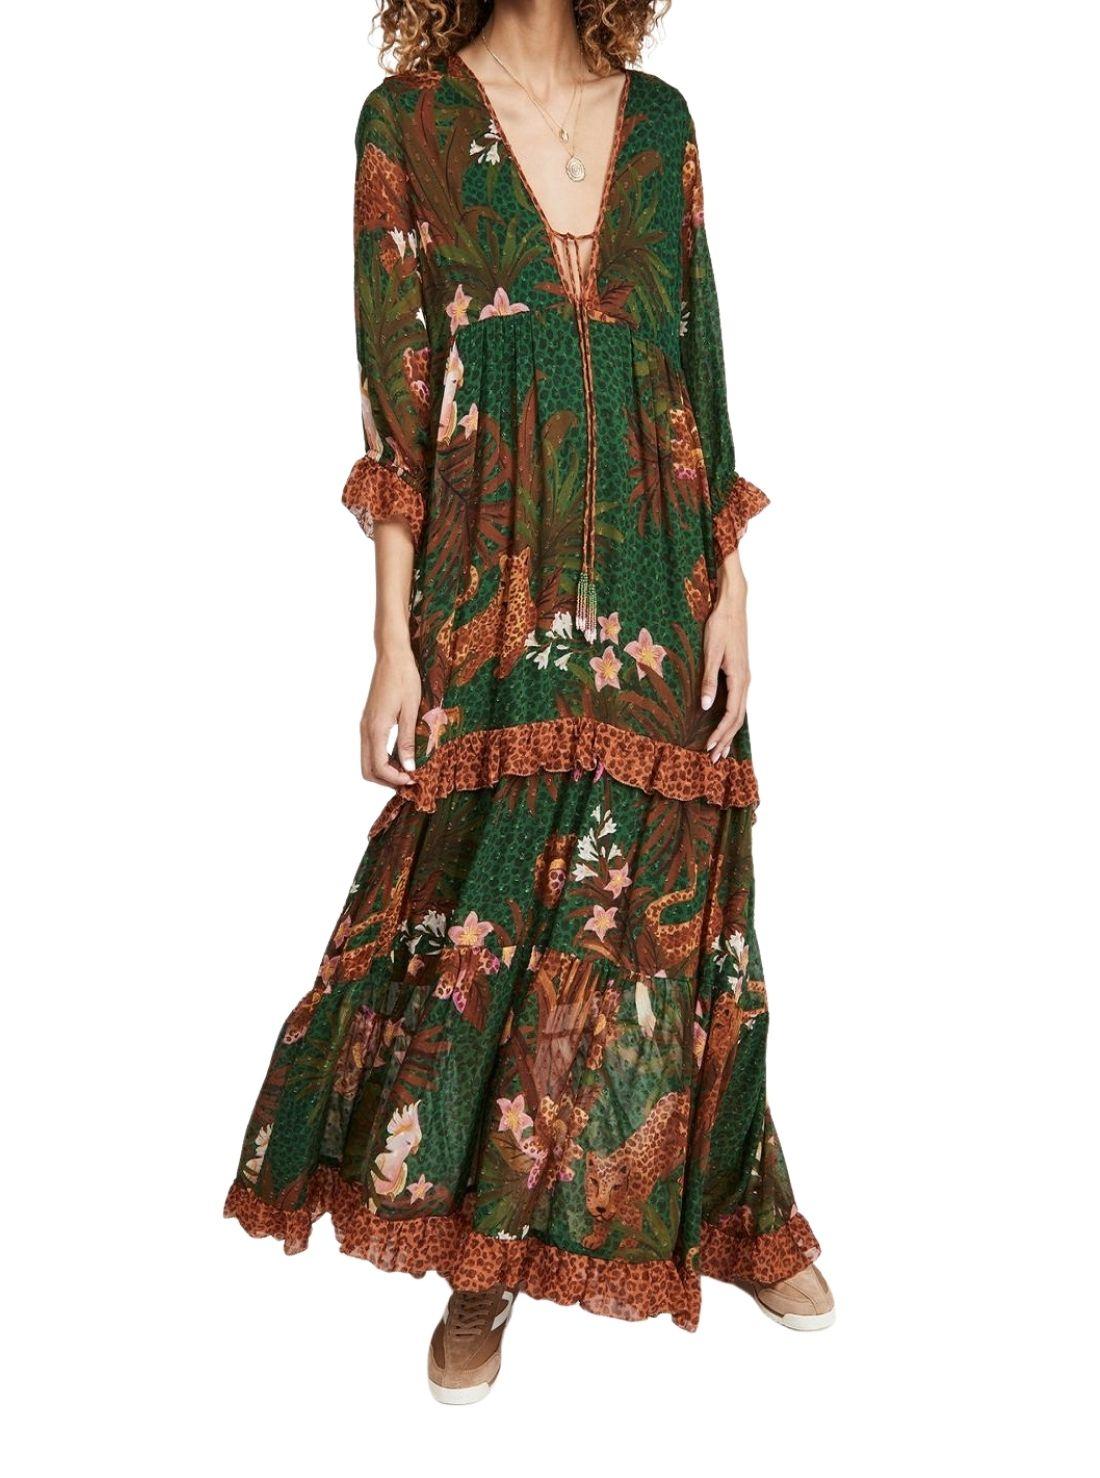 Wholesale Beachy Boho Dress